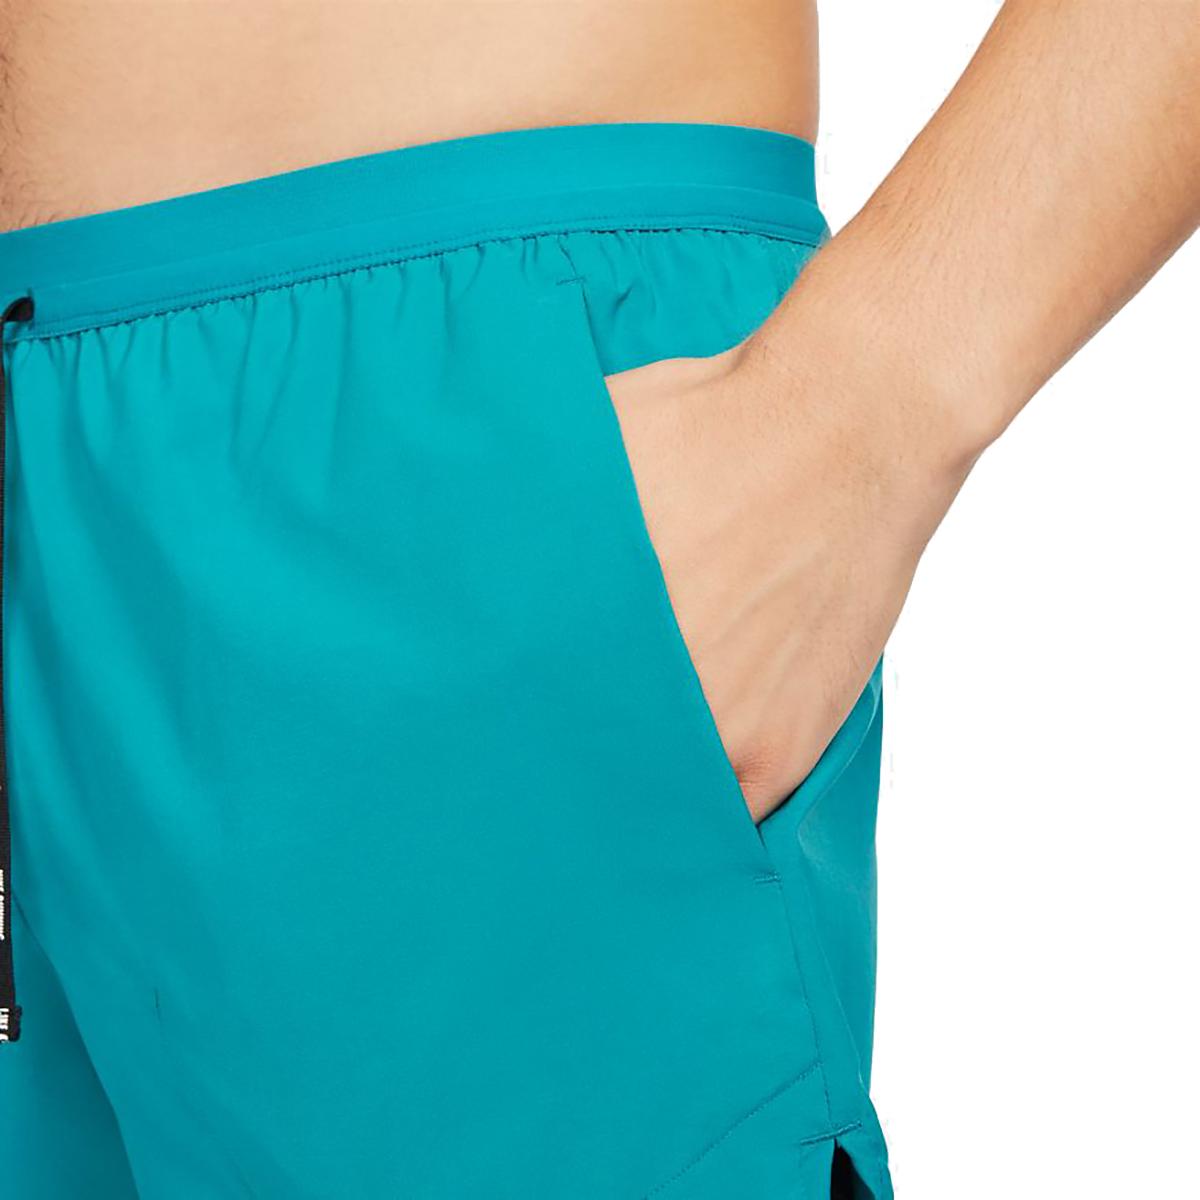 "Men's Nike Flex Stride 5"" Brief Running Shorts, , large, image 3"